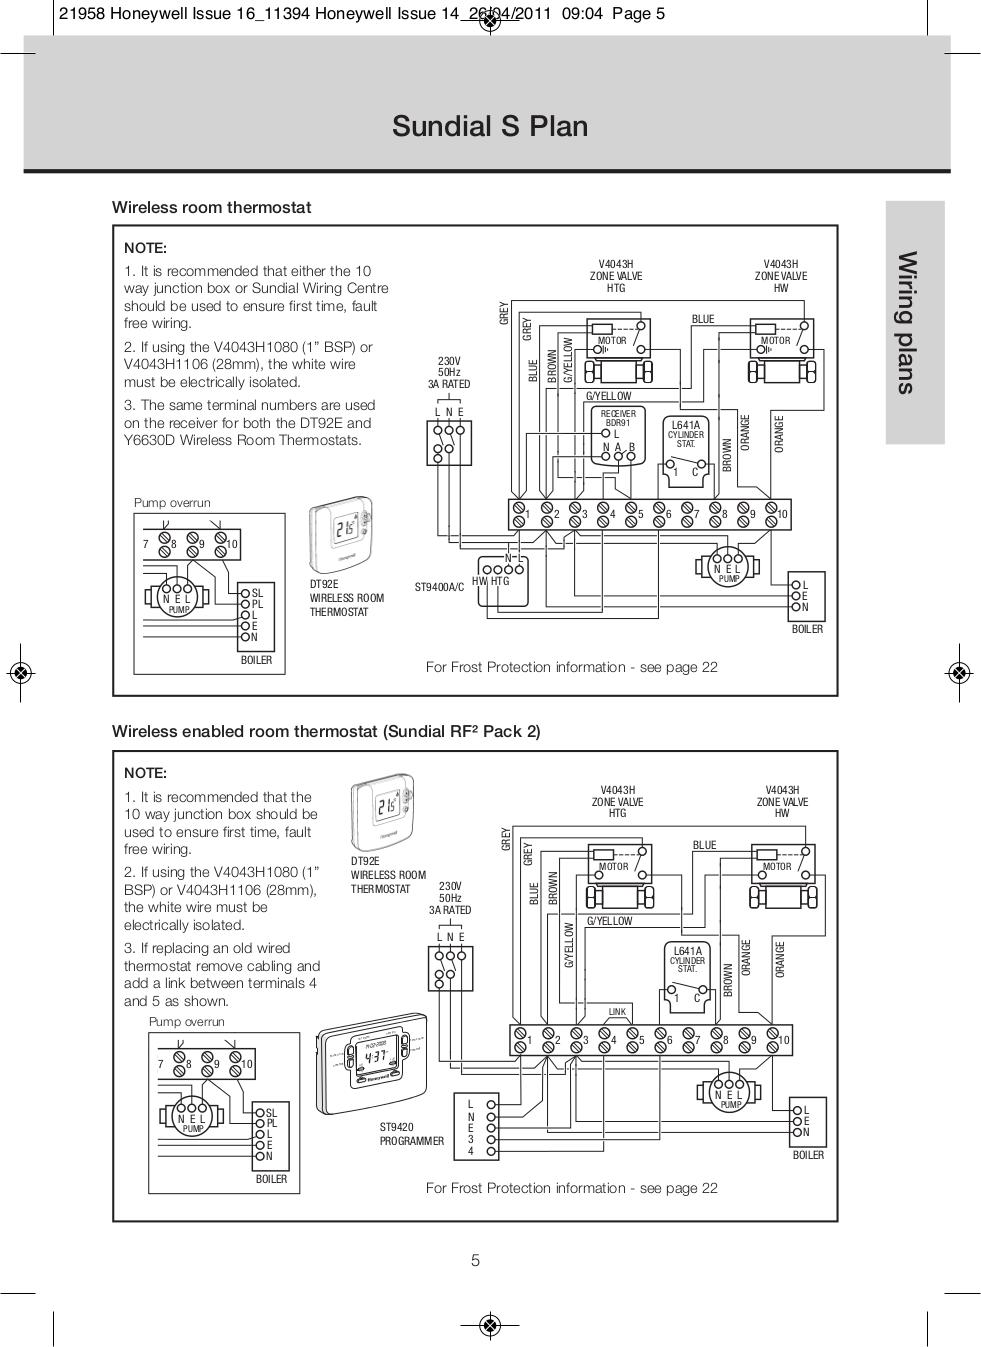 Pdf Manual For Toa Amp Bg 130 Pump Overrun Wiring